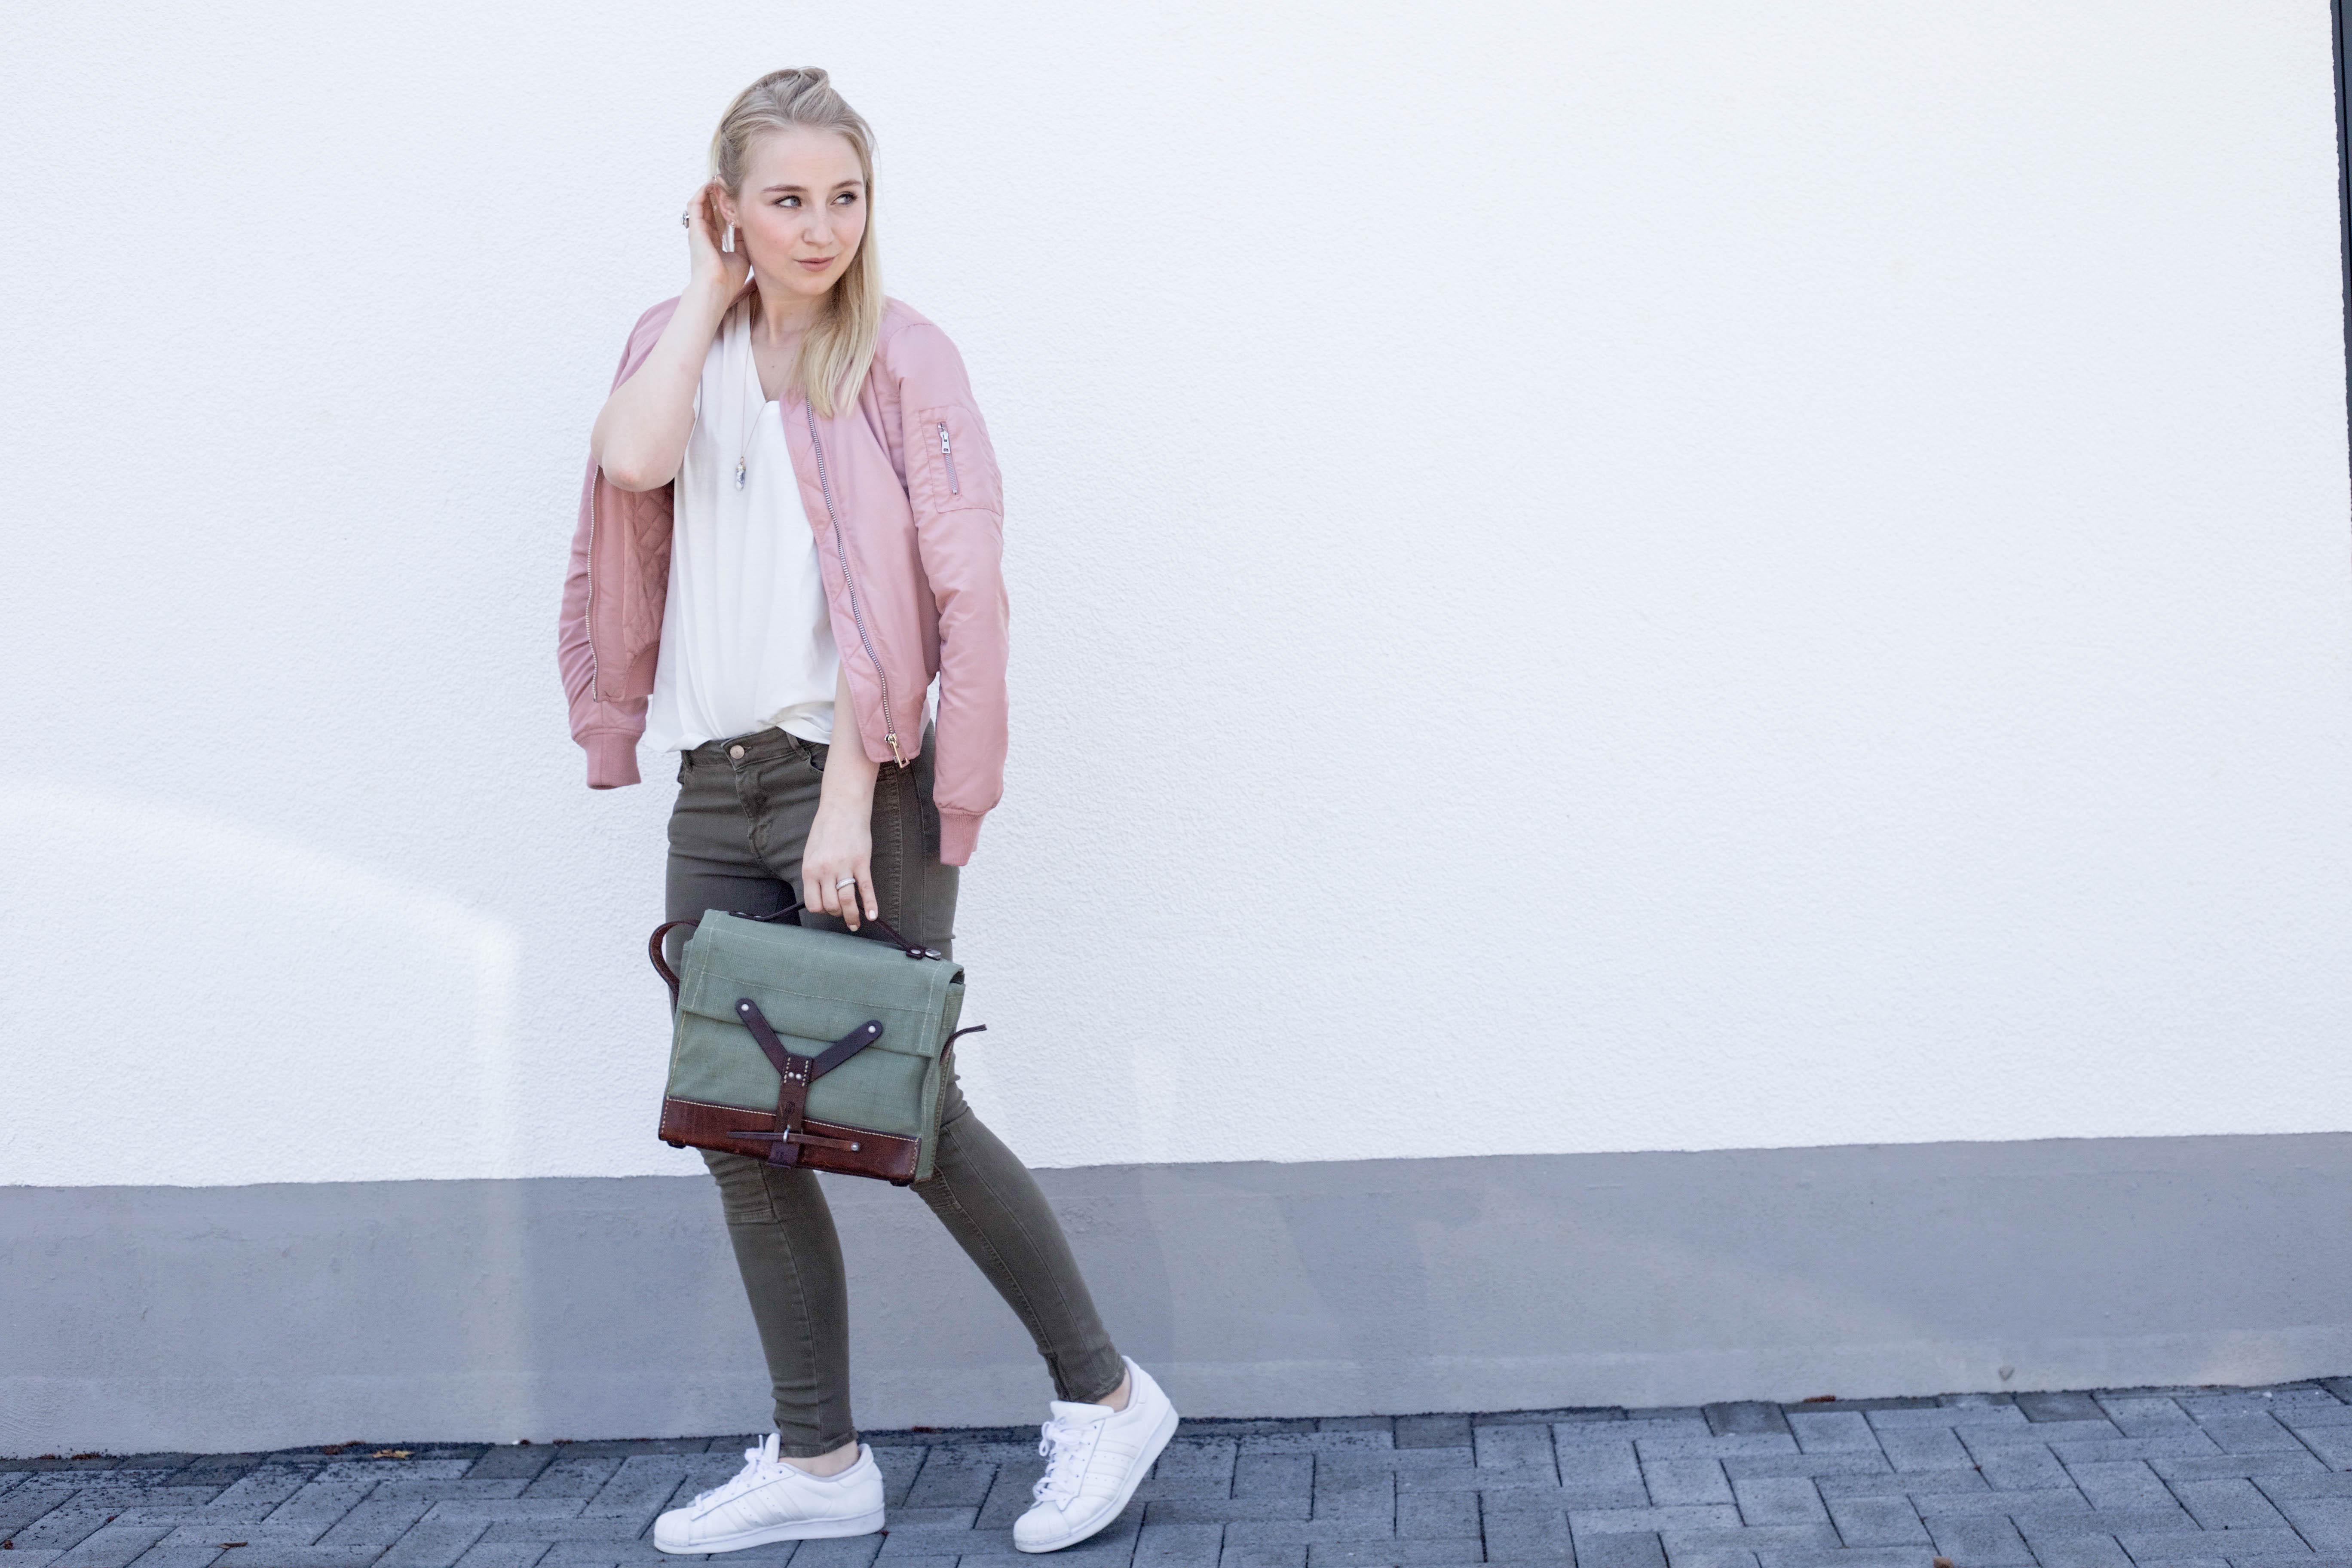 rosa-bomberjacke-weiße-sneaker-adidas superstars-outfit-fashionblog-cologne-berlin_0834